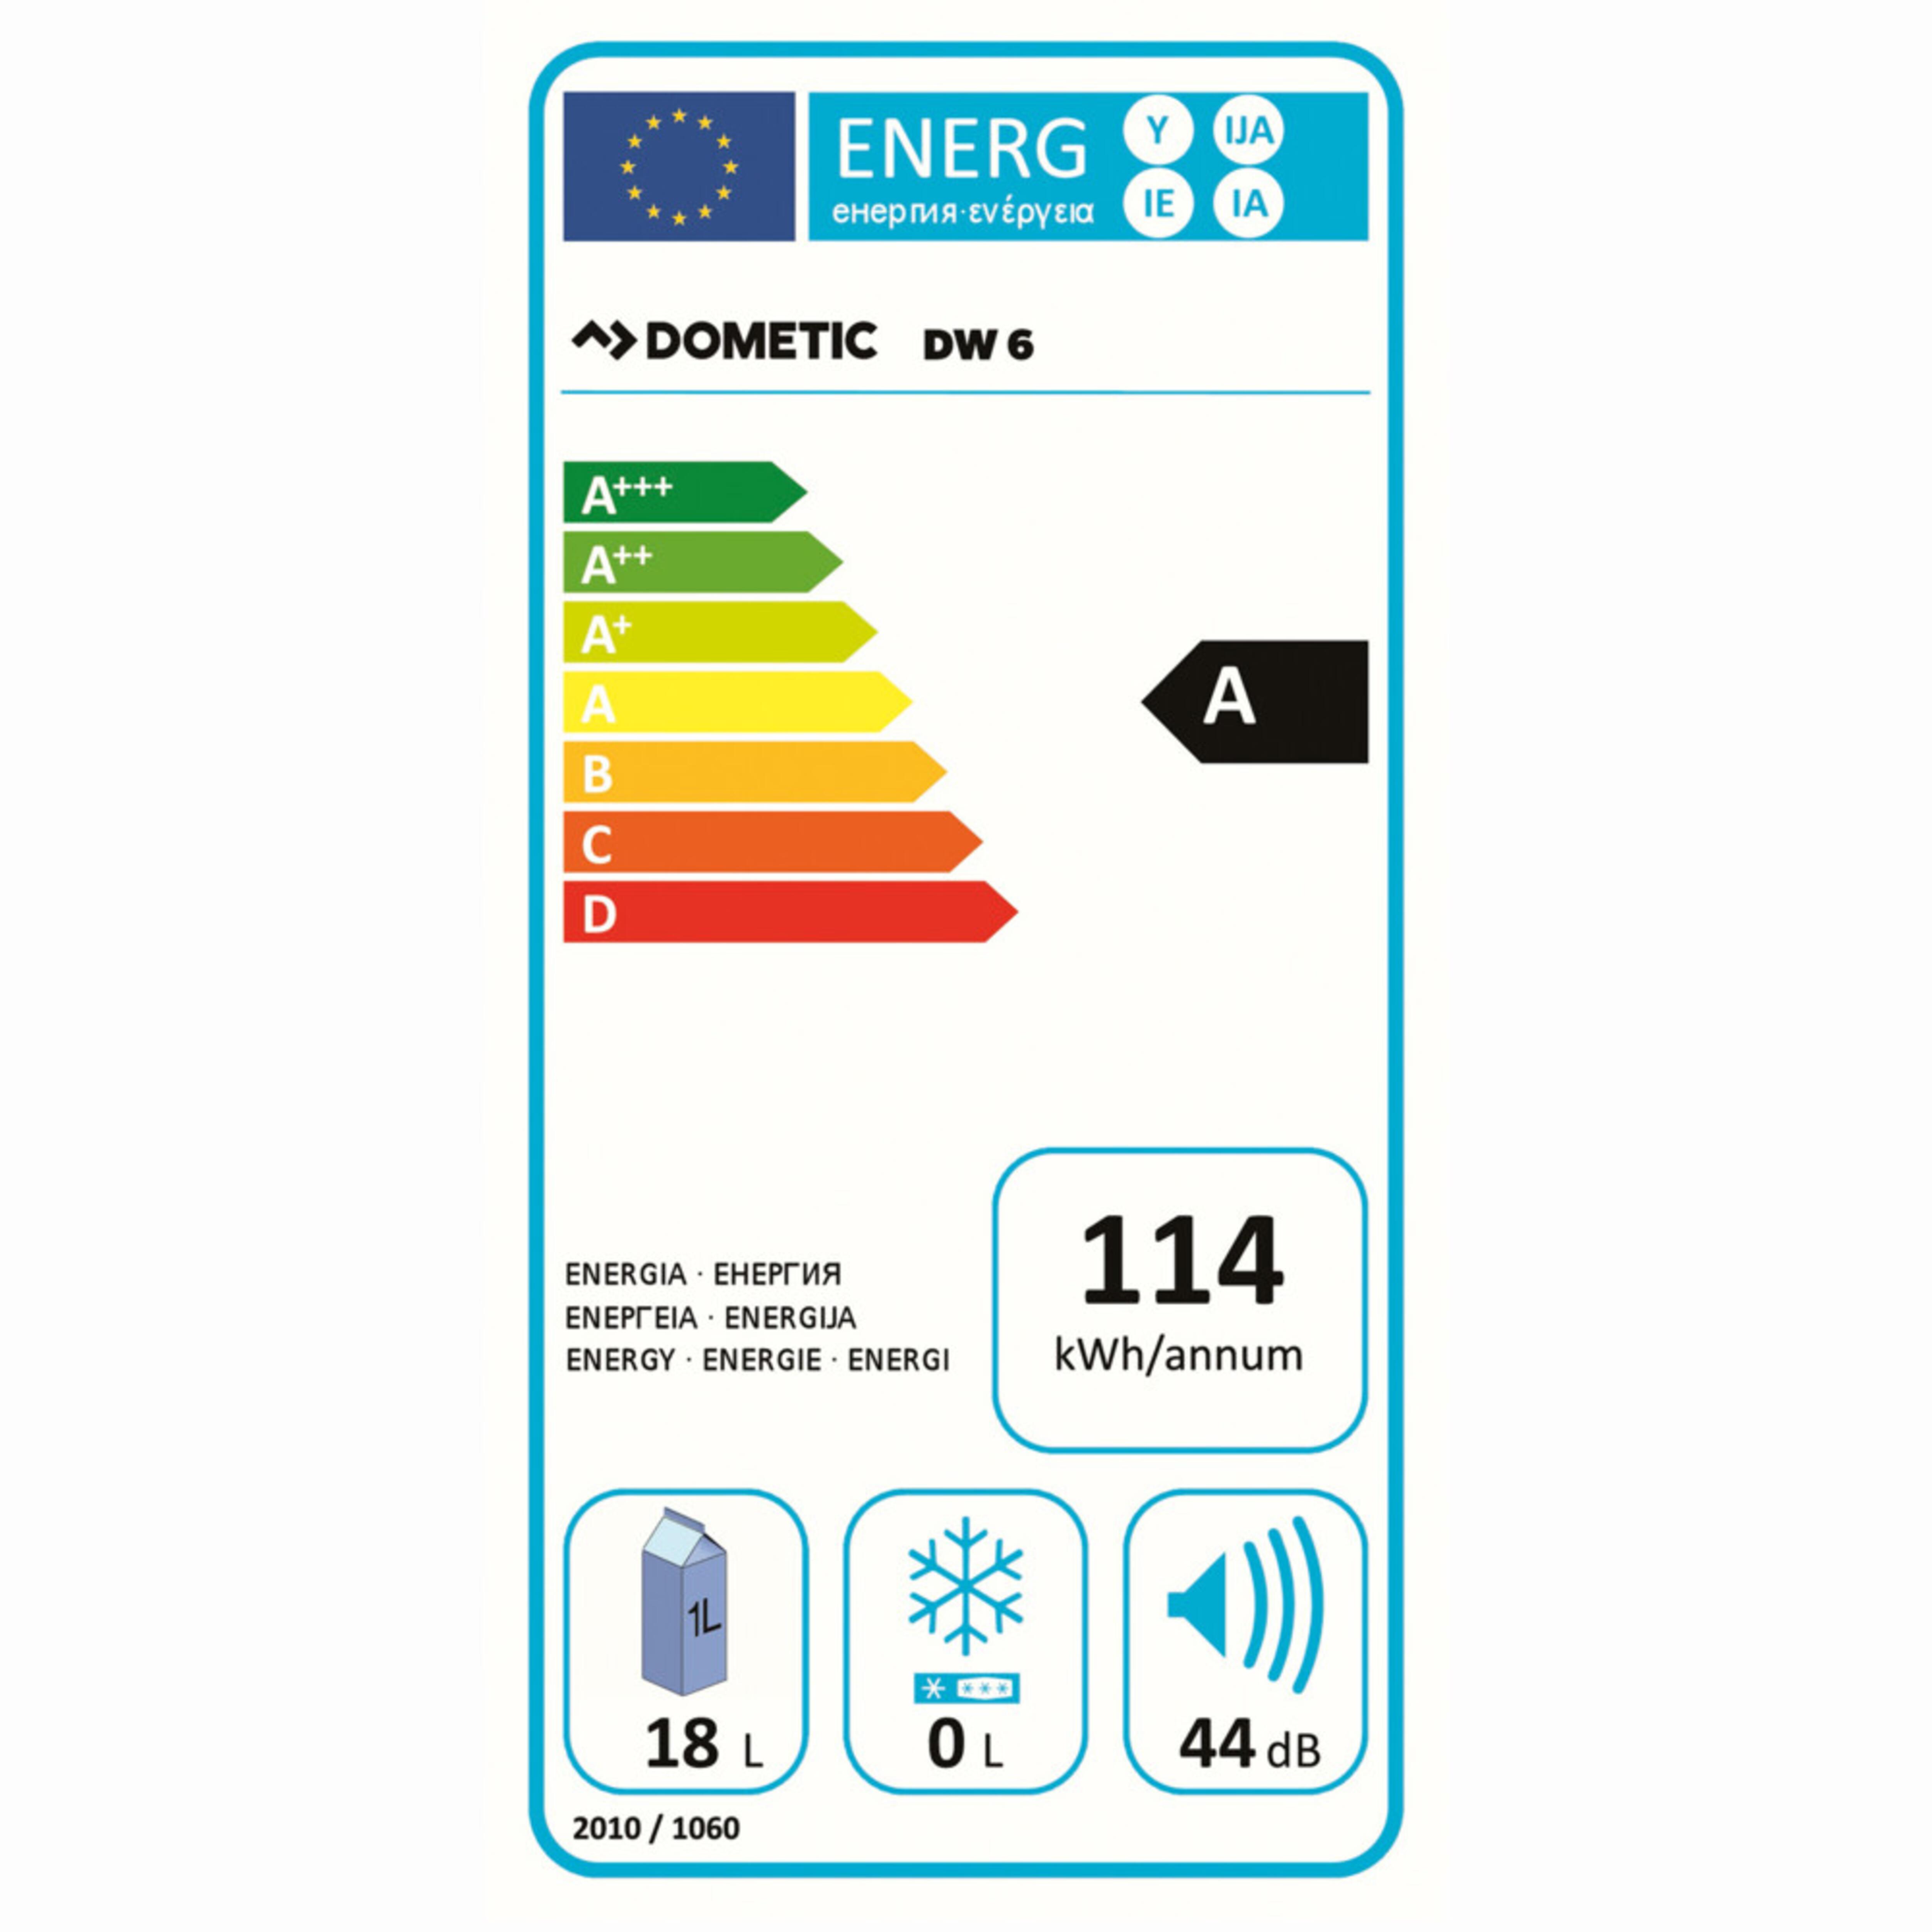 Dometic DW 6 Energielabel